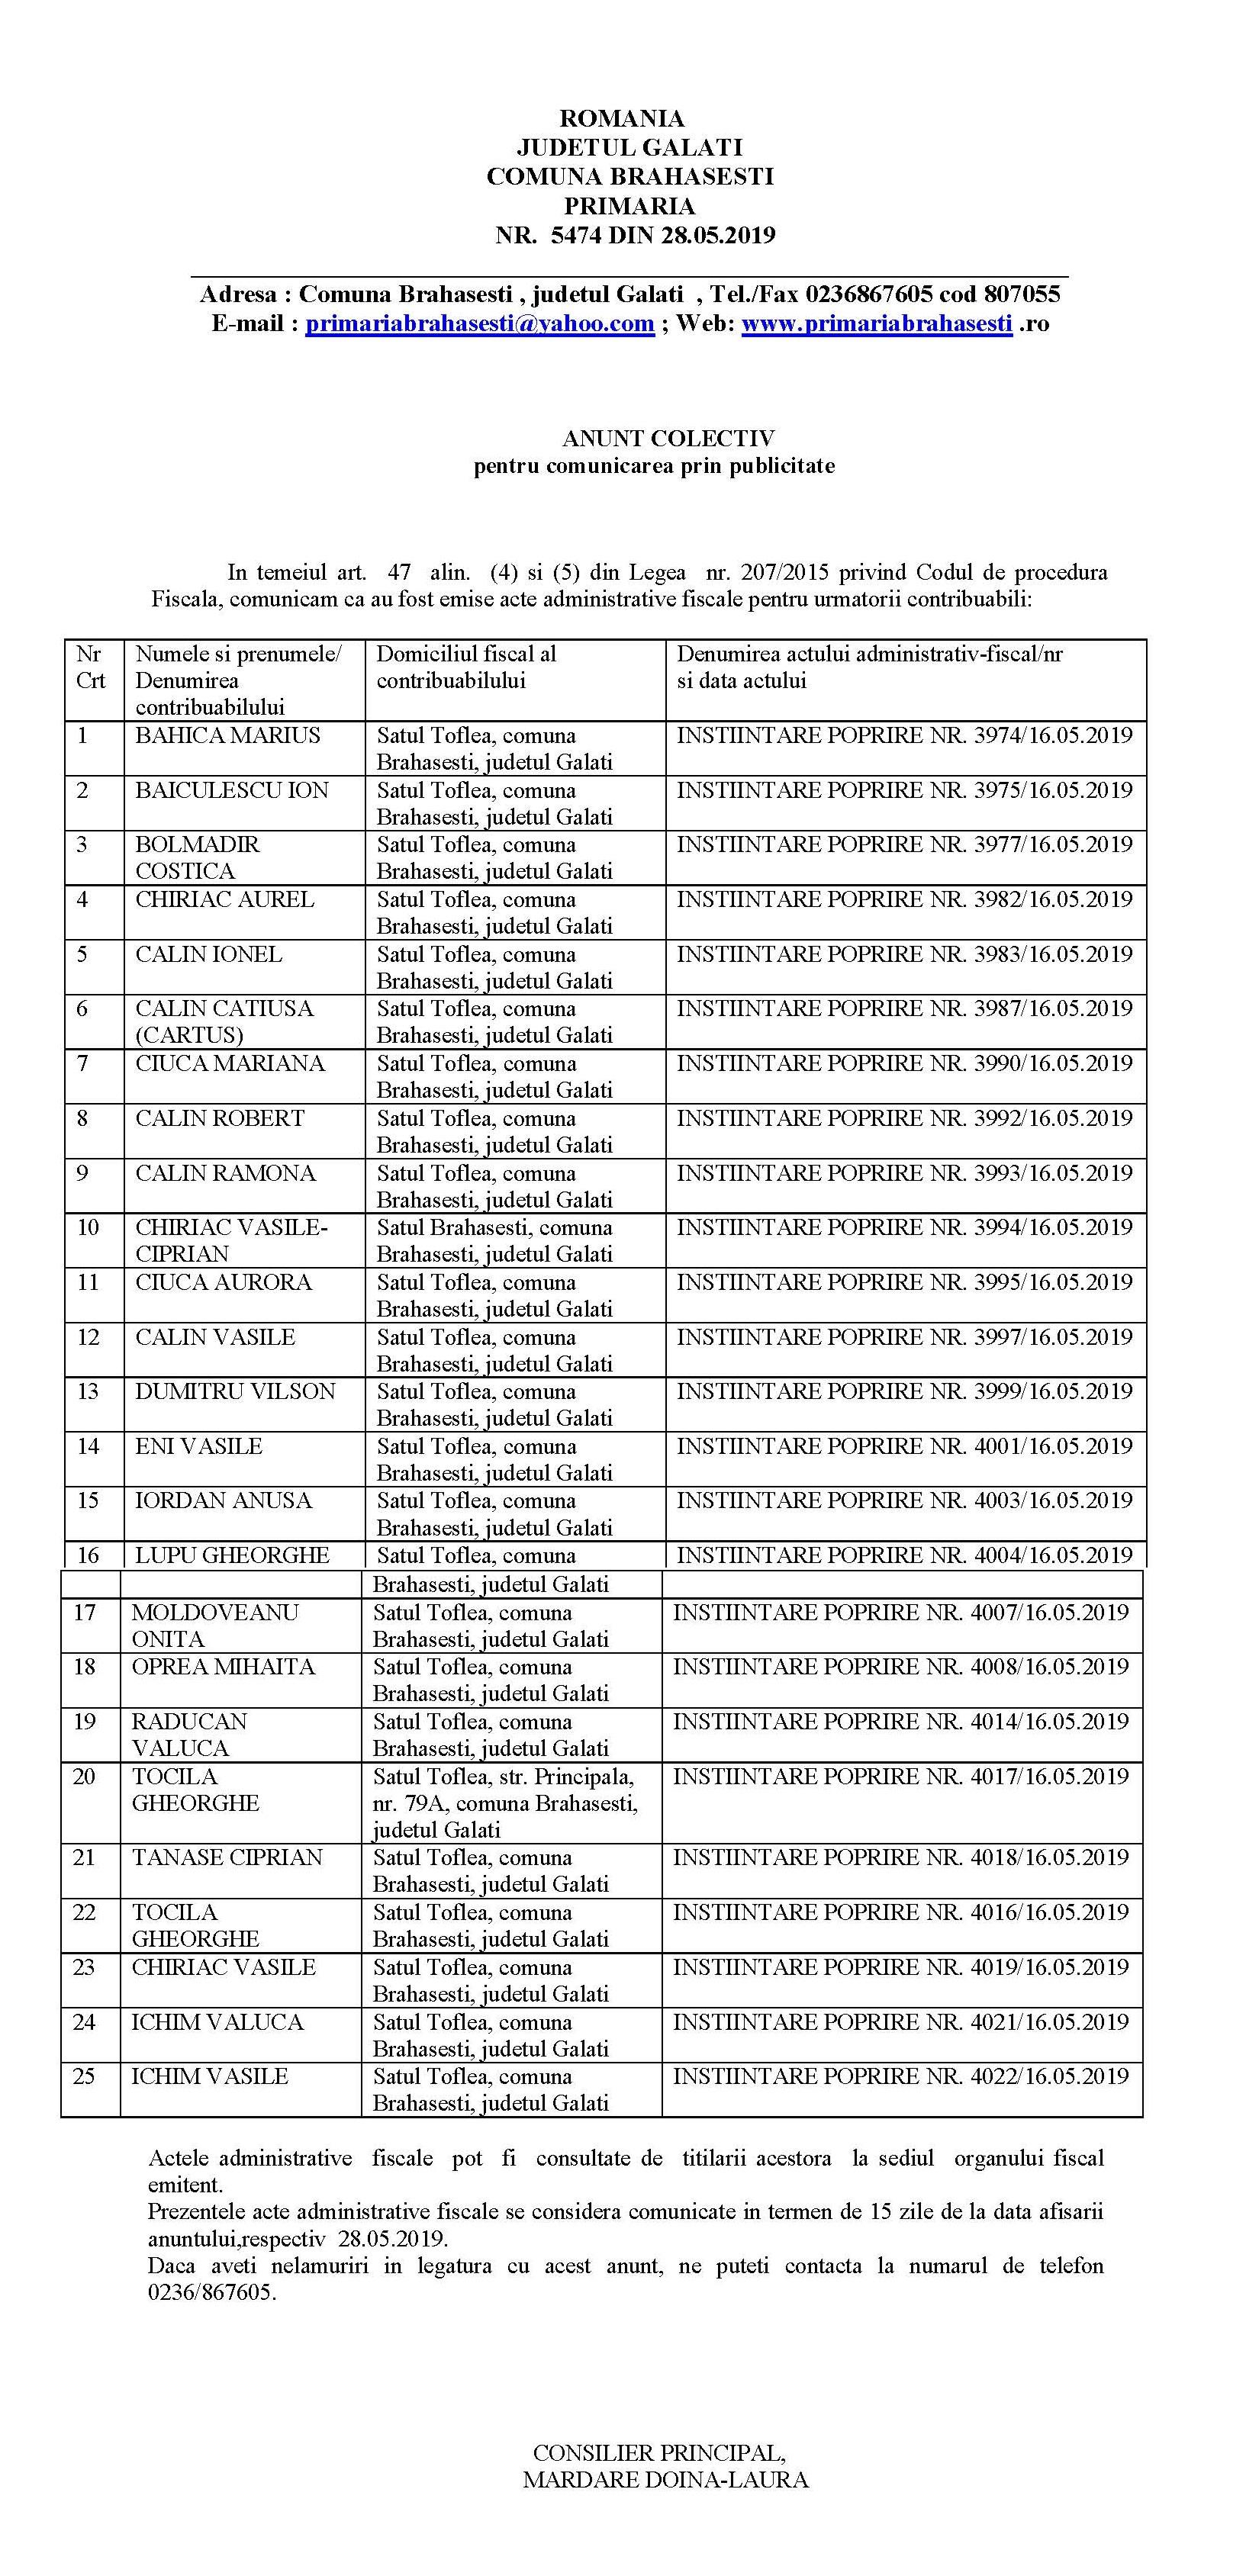 ANUNT COLECTIV INSTIINTARI POPRIRE 9.2019_Page_1